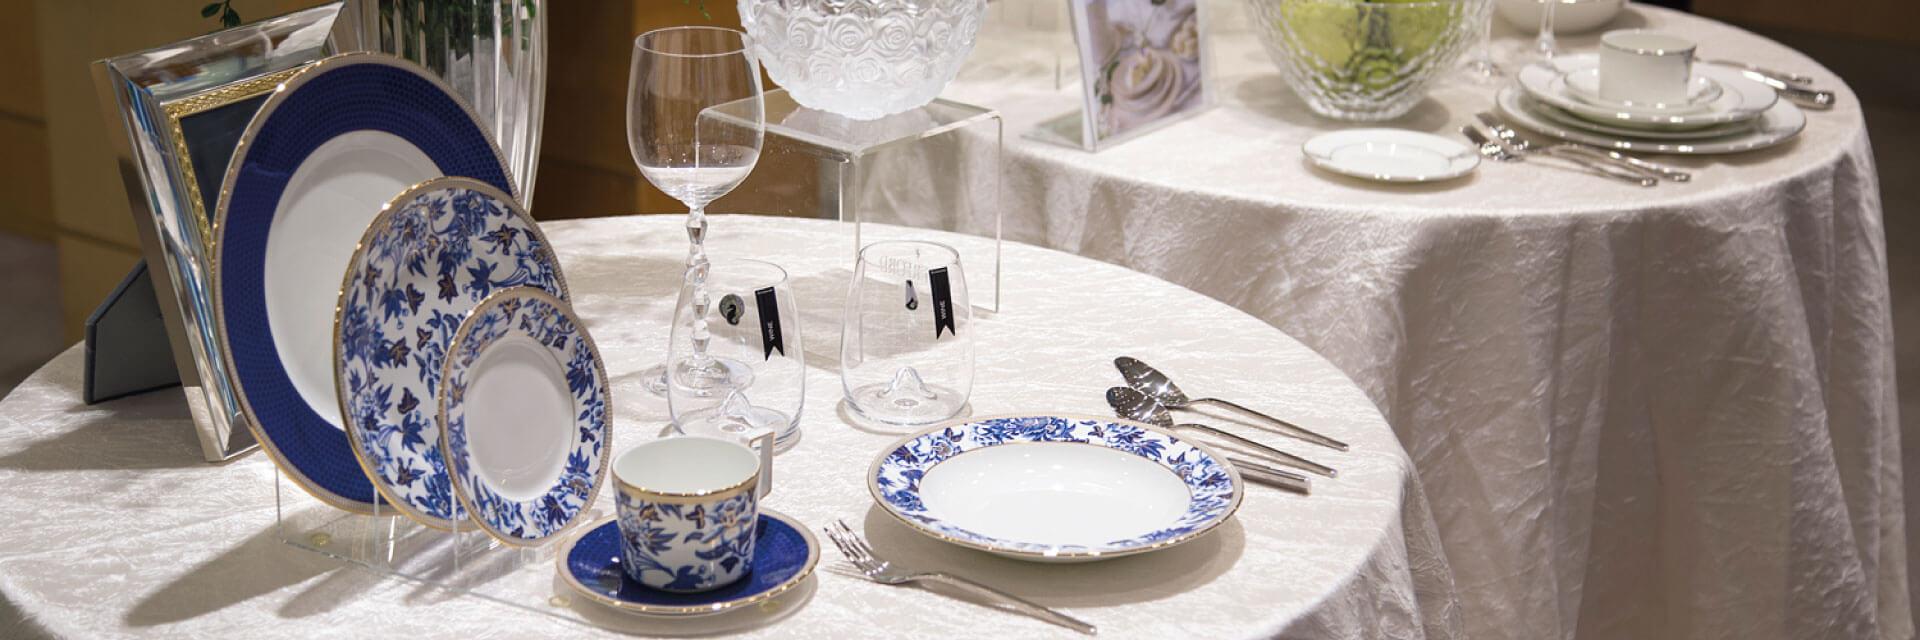 Gift & Wedding Registries at Kirk Freeport in Grand Cayman